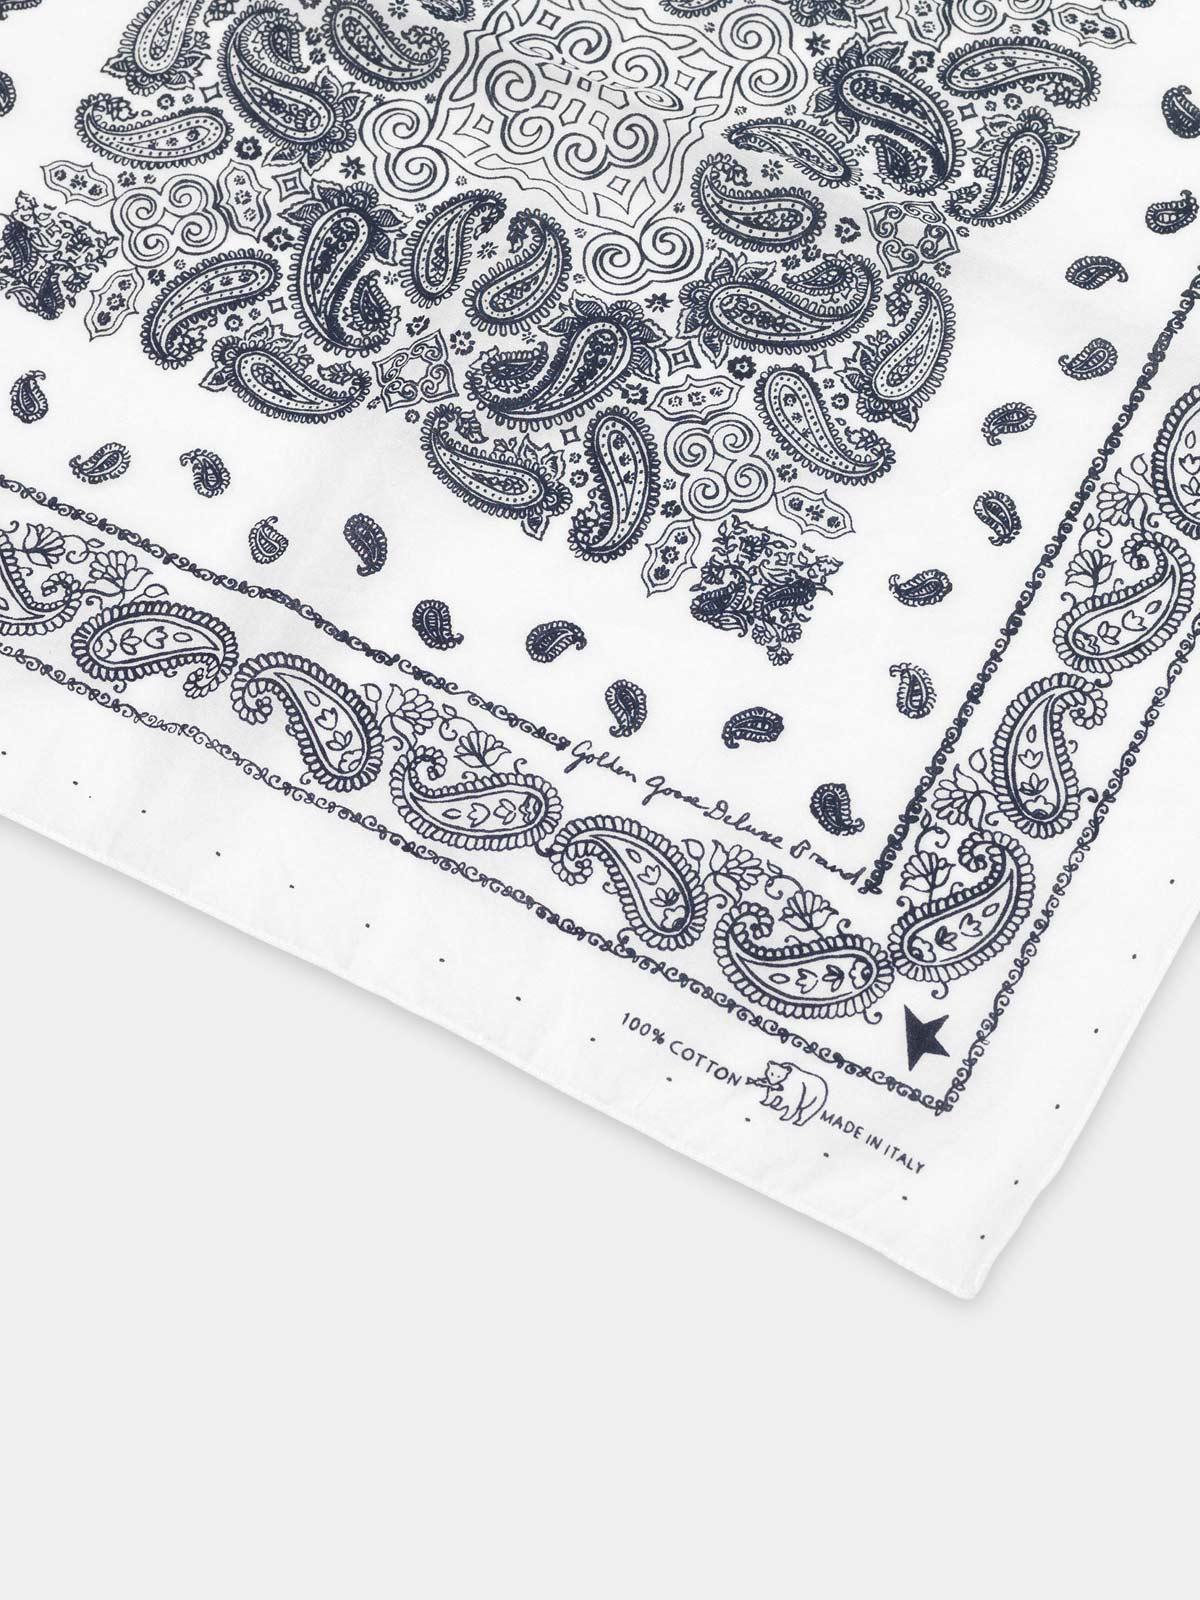 Golden Goose - Cotton Jiro bandana with paisley pattern in